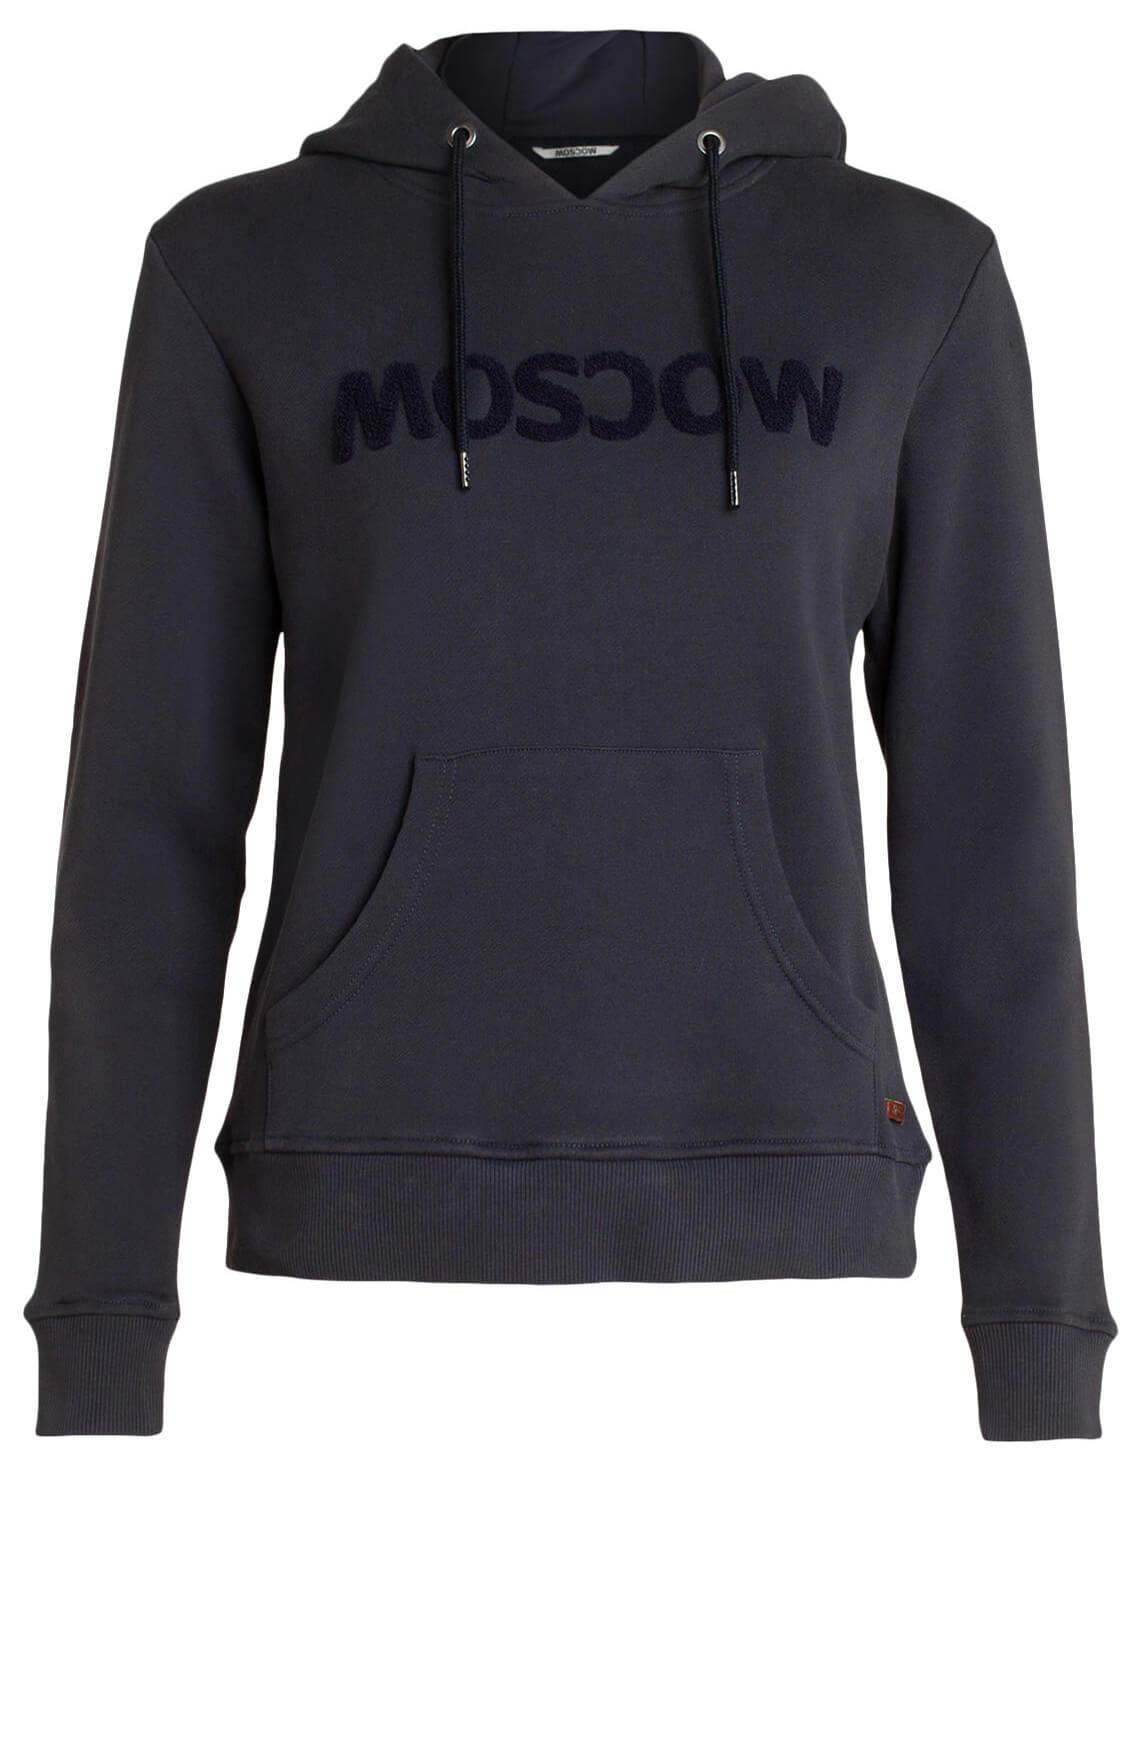 Moscow Dames Sweater met capuchon Blauw